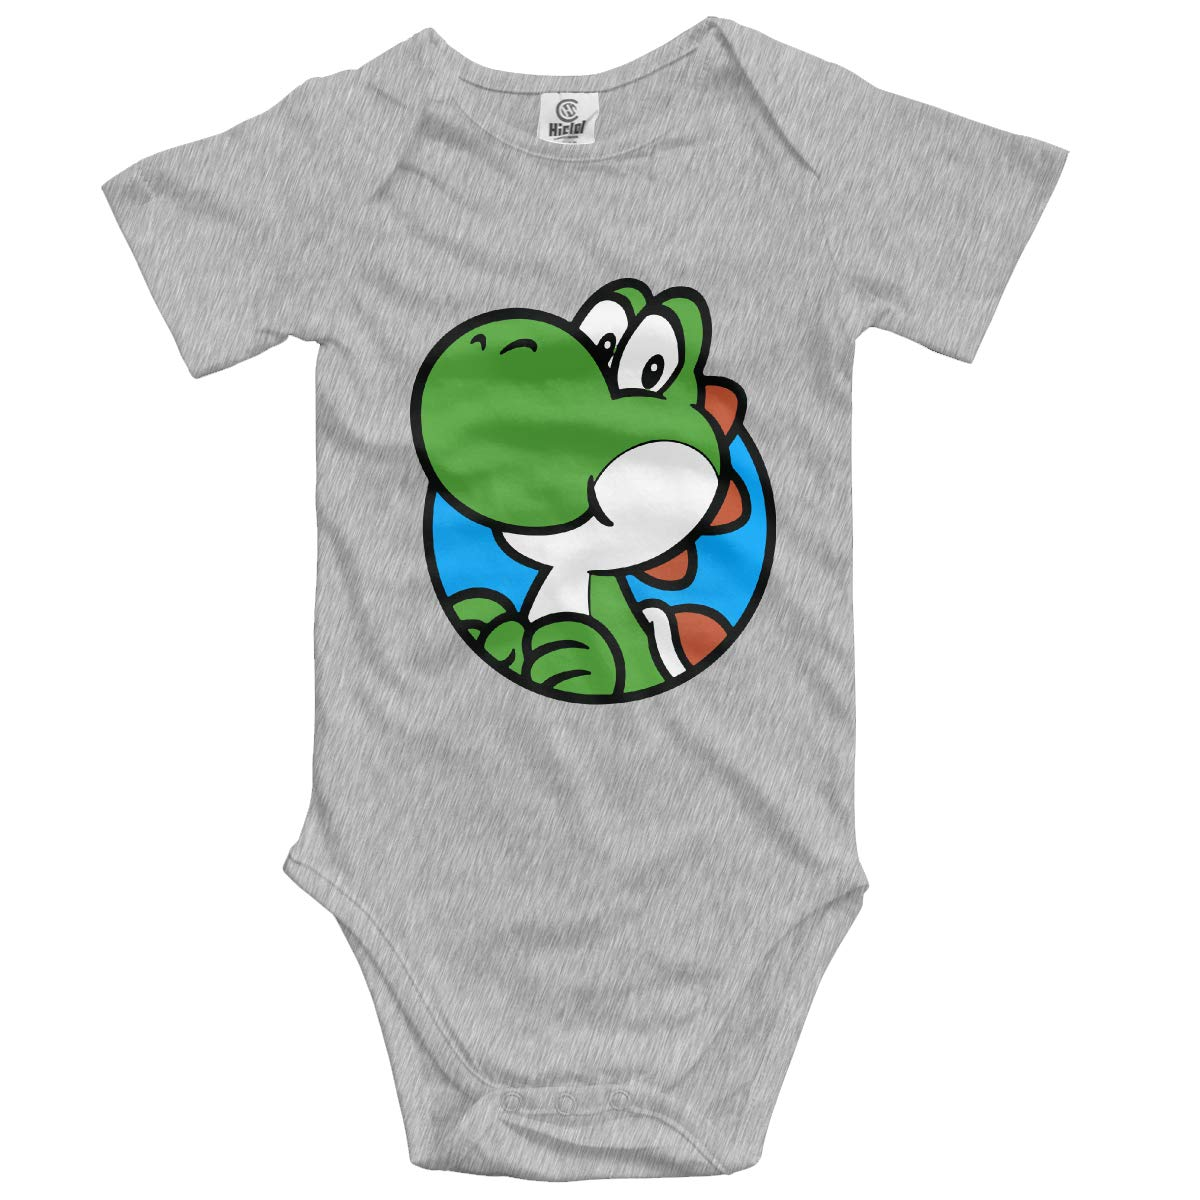 J122 Newborn Dinosaur Companion Short Sleeve Climbing Clothes Playsuit Suit 6-24 Months